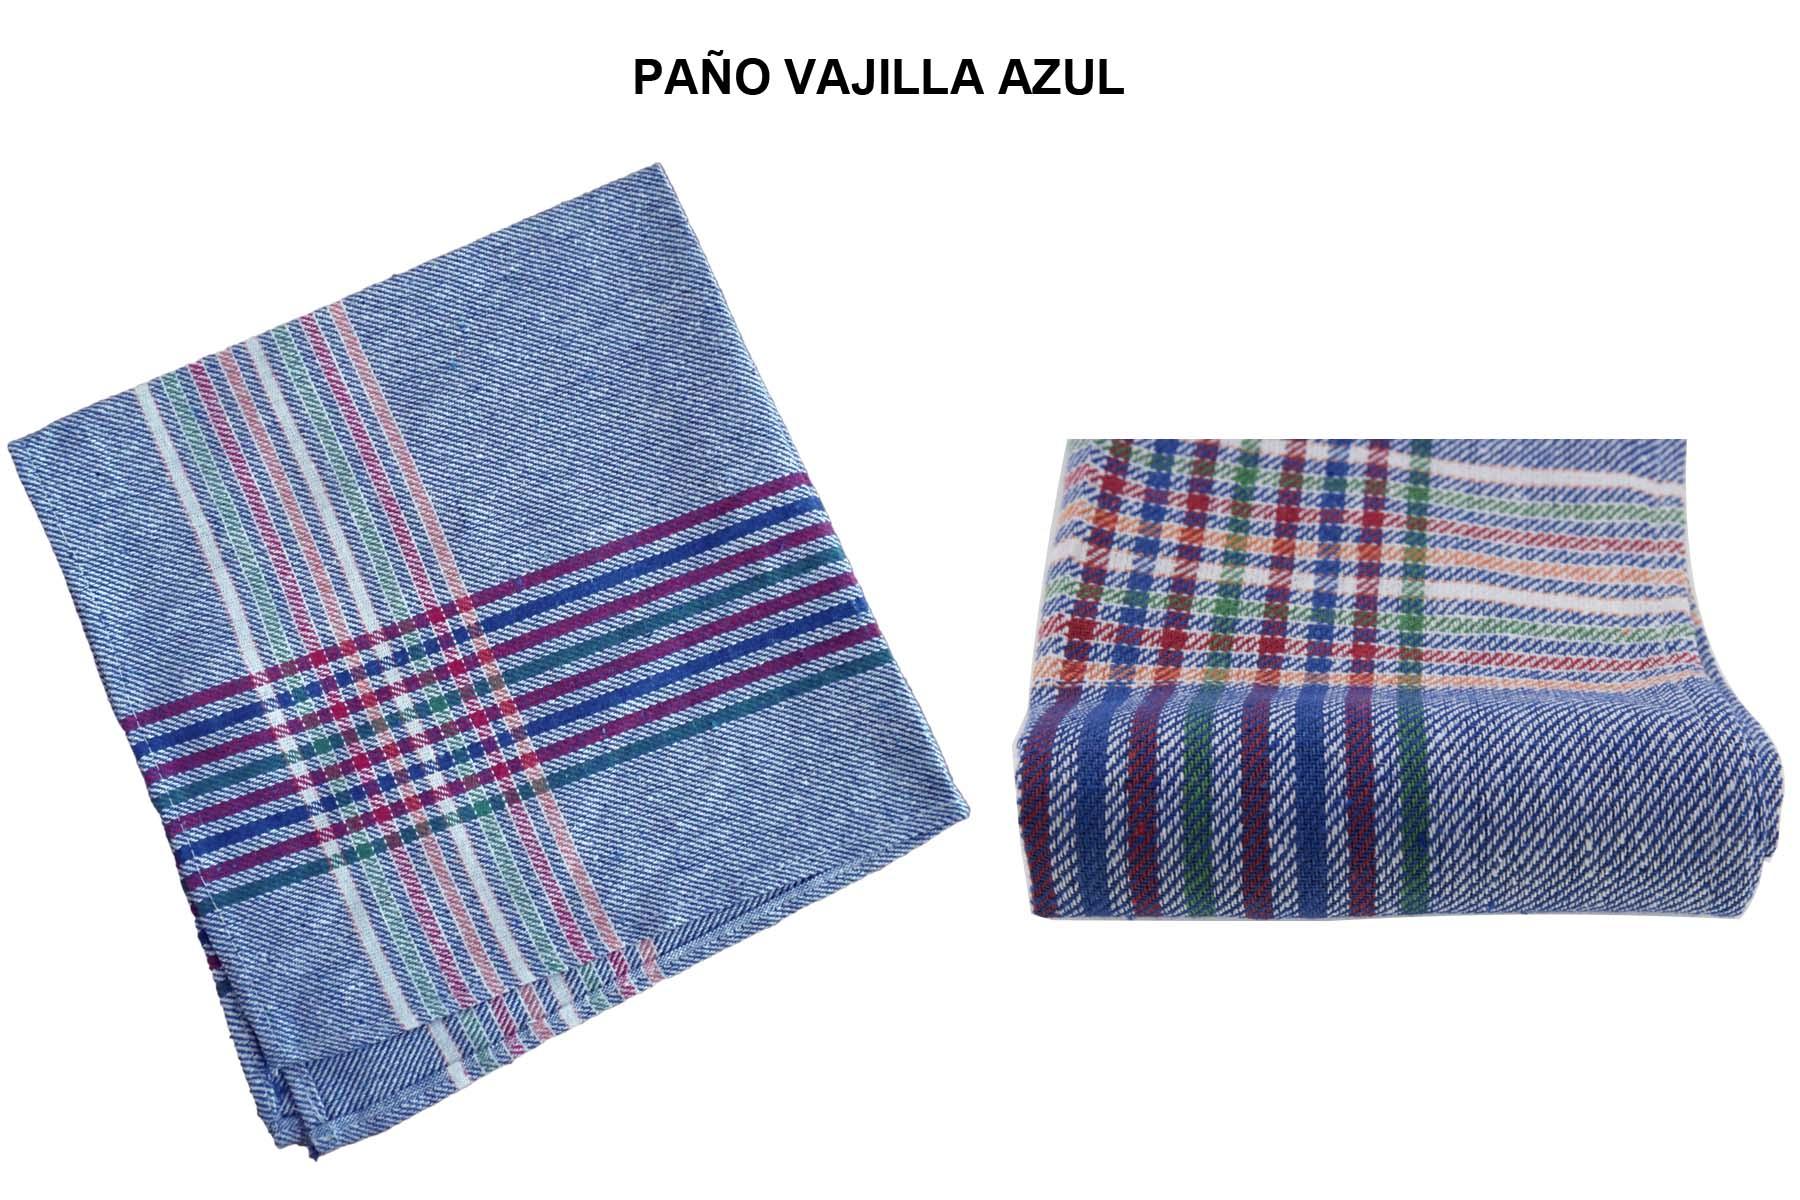 PAÑO VAJILLA AZUL